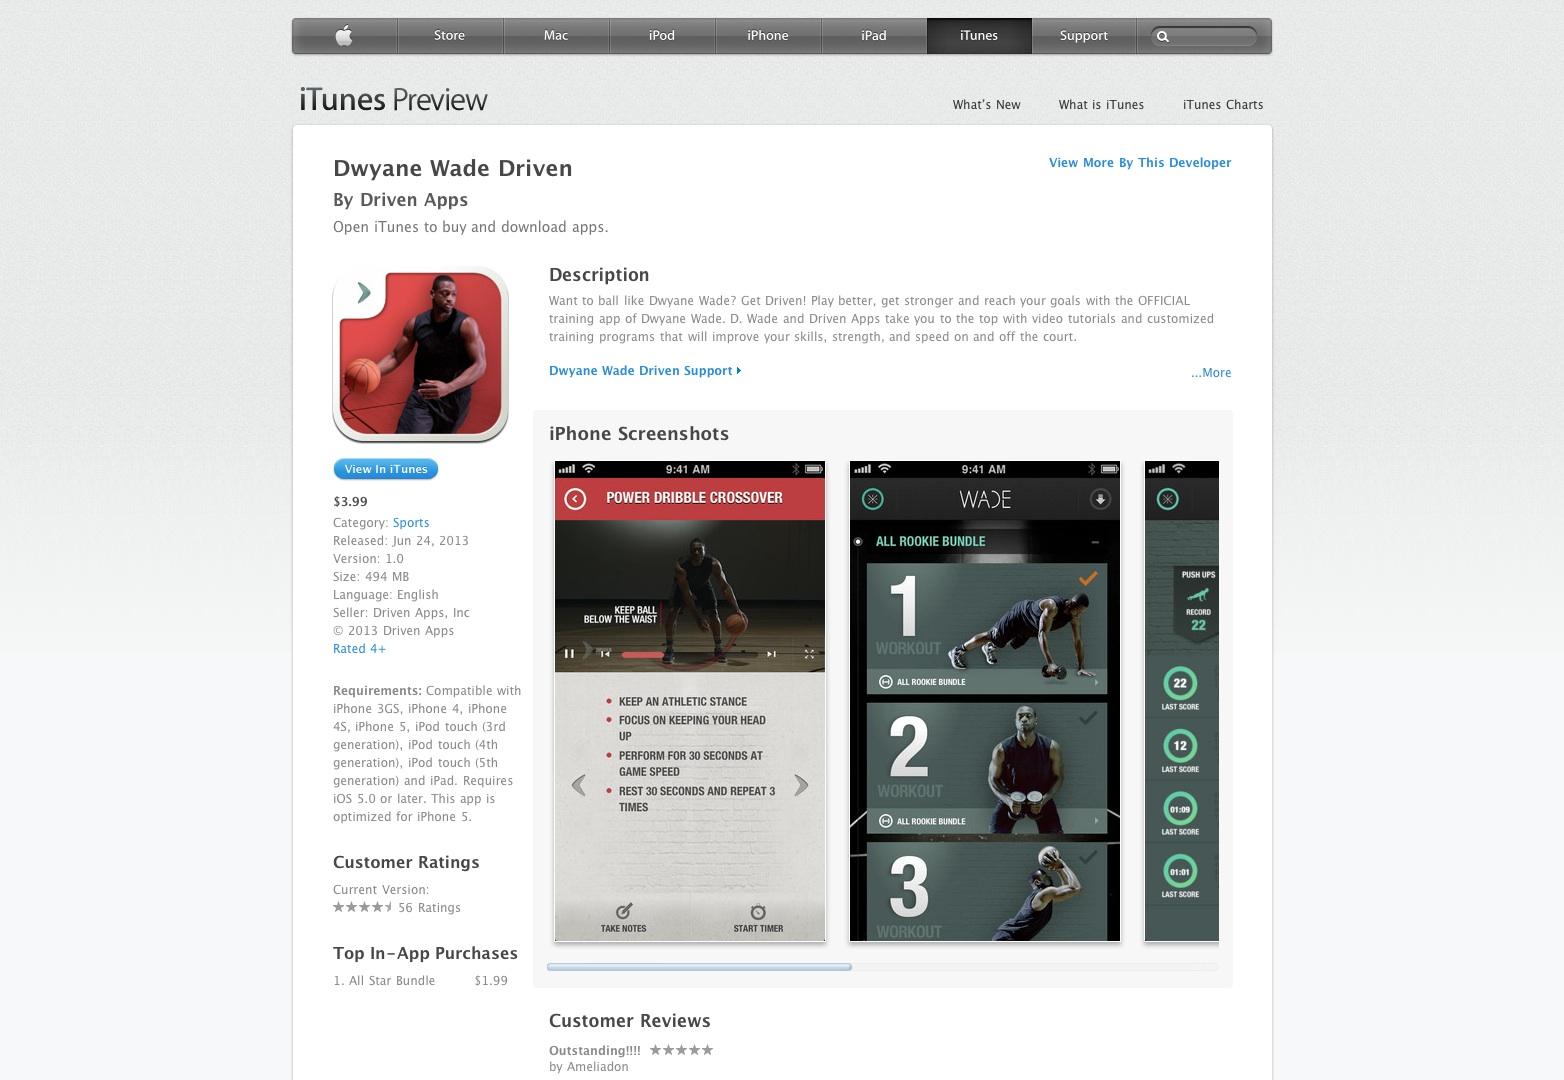 Dwyane Wade Driven para iPhone 3GS, iPhone 4, iPhone 4S, iPhone 5, iPod touch (3ª generación), iPod touch (4ª generación), iPod touch (5ª generación) y iPad en el App Store de iTunes